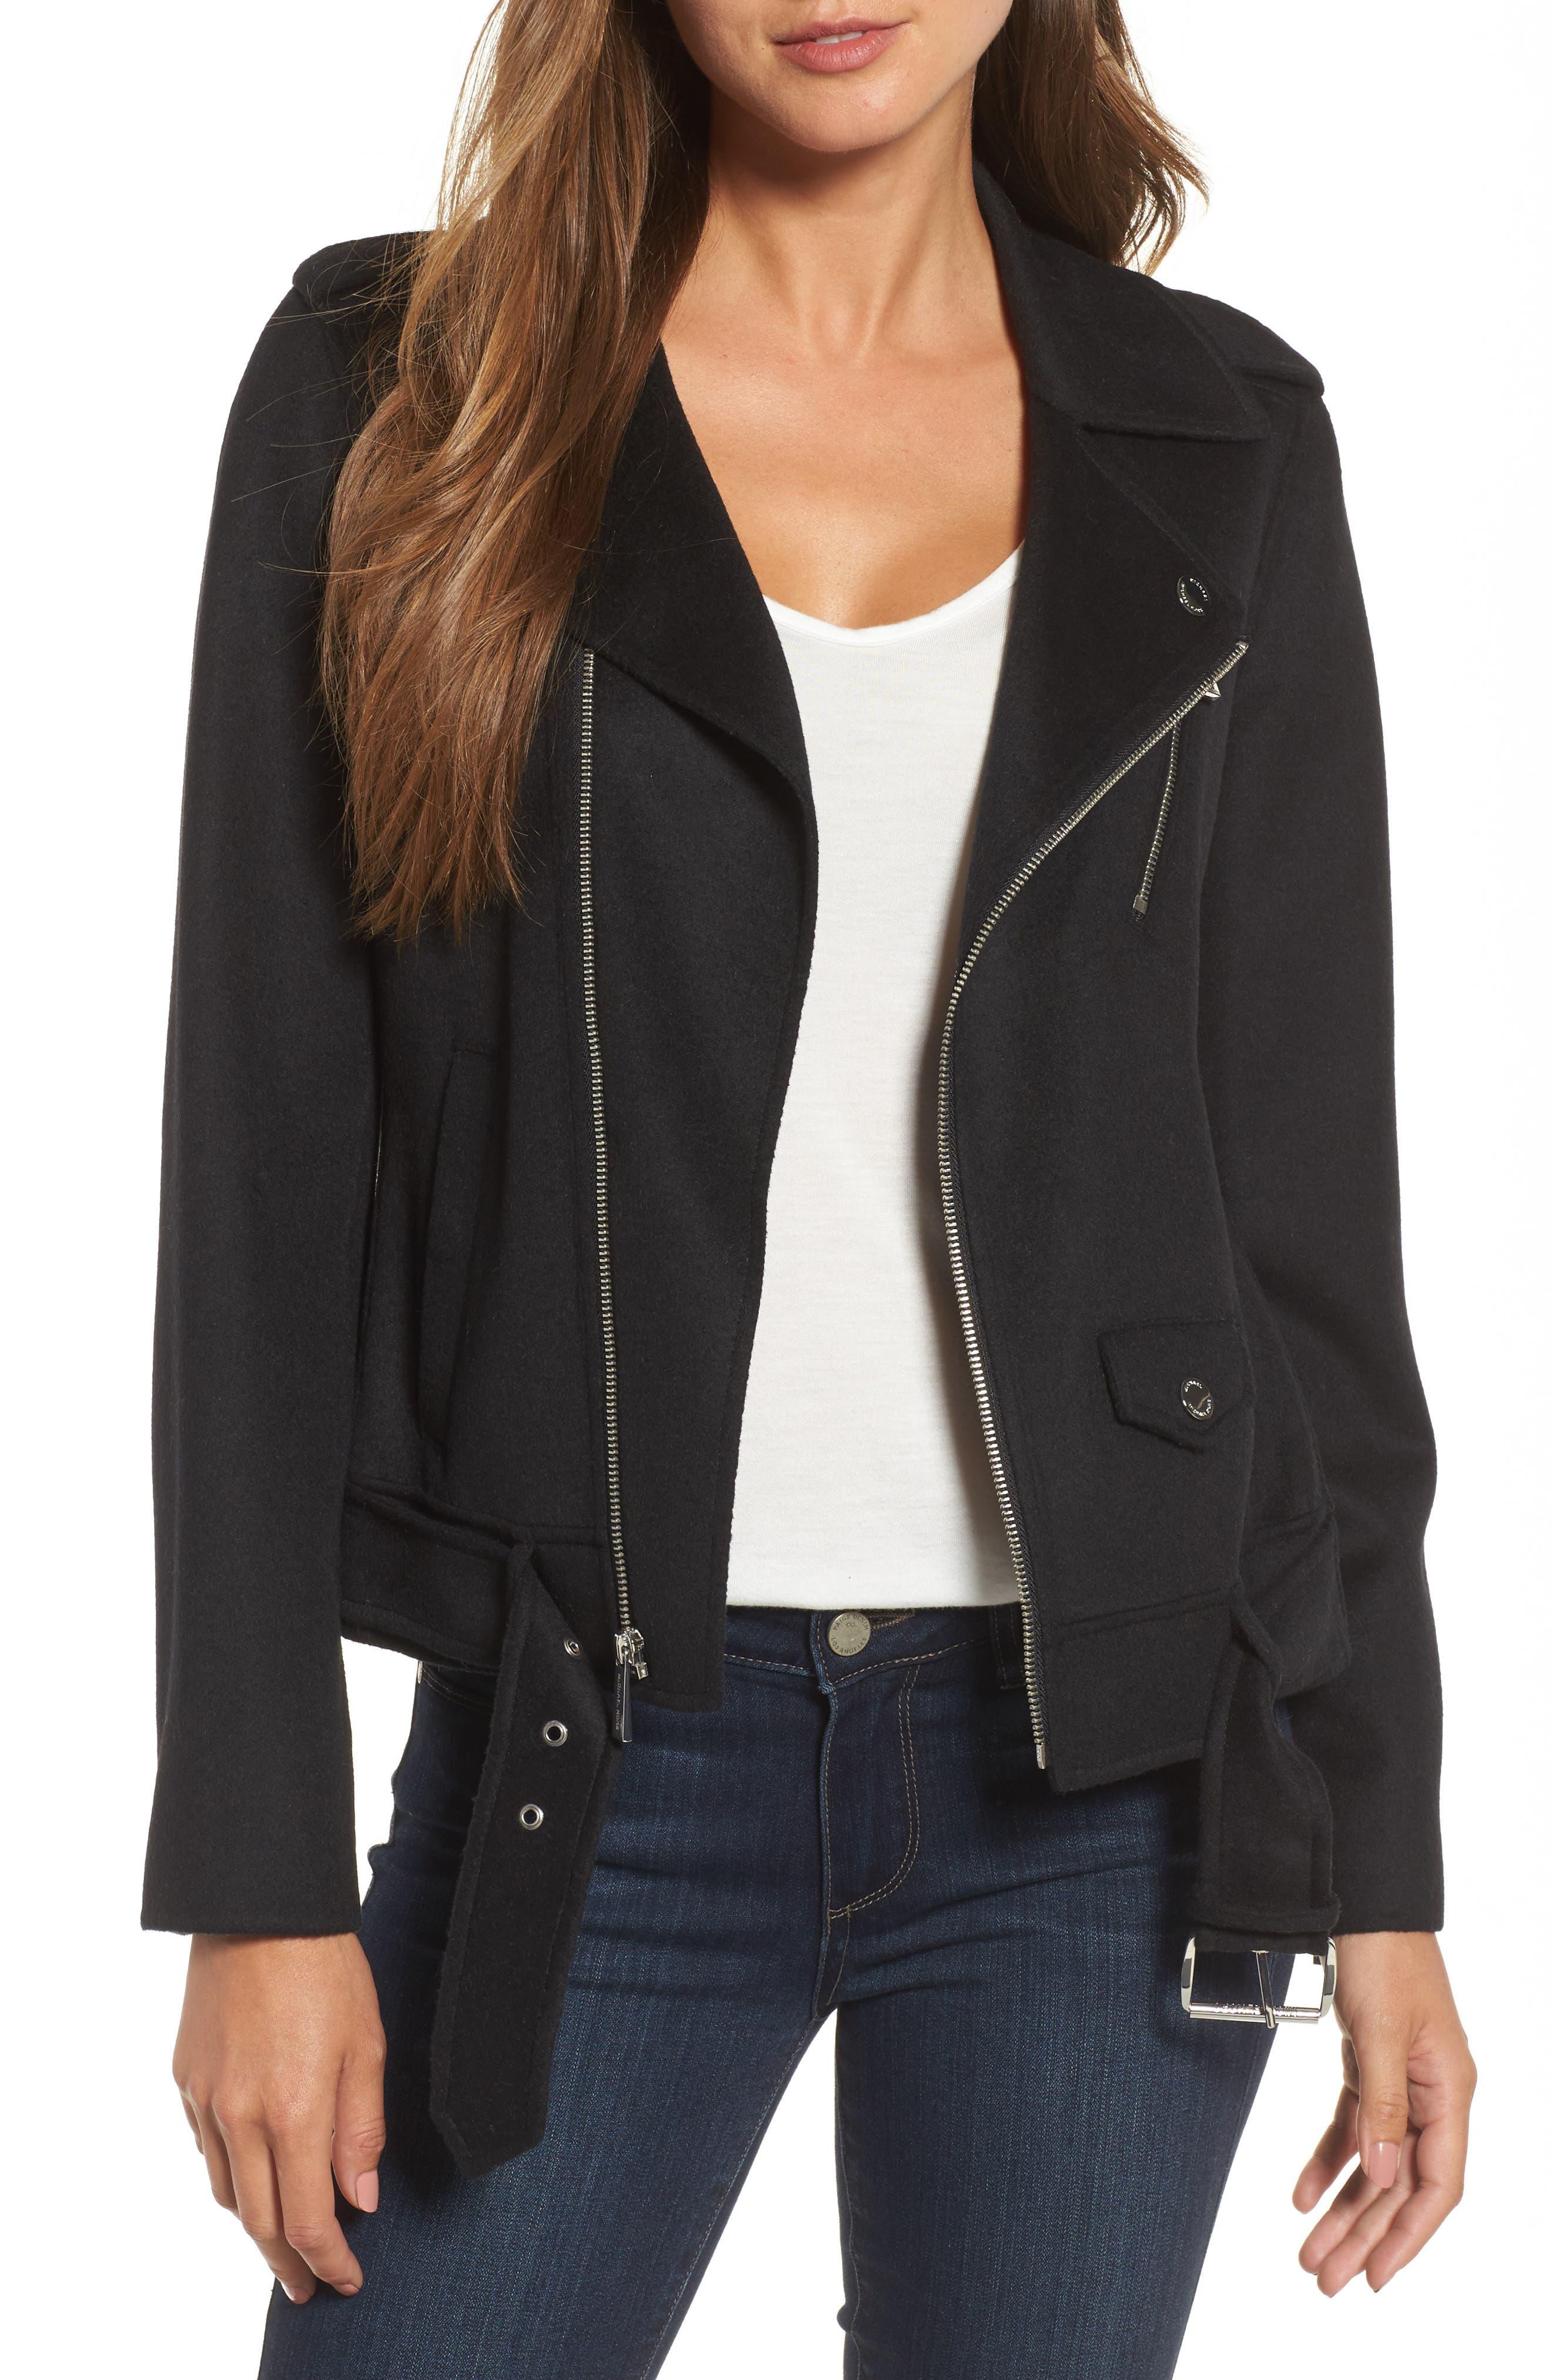 Alternate Image 1 Selected - MICHAEL Michael Kors Wool Blend Moto Jacket (Regular & Petite)